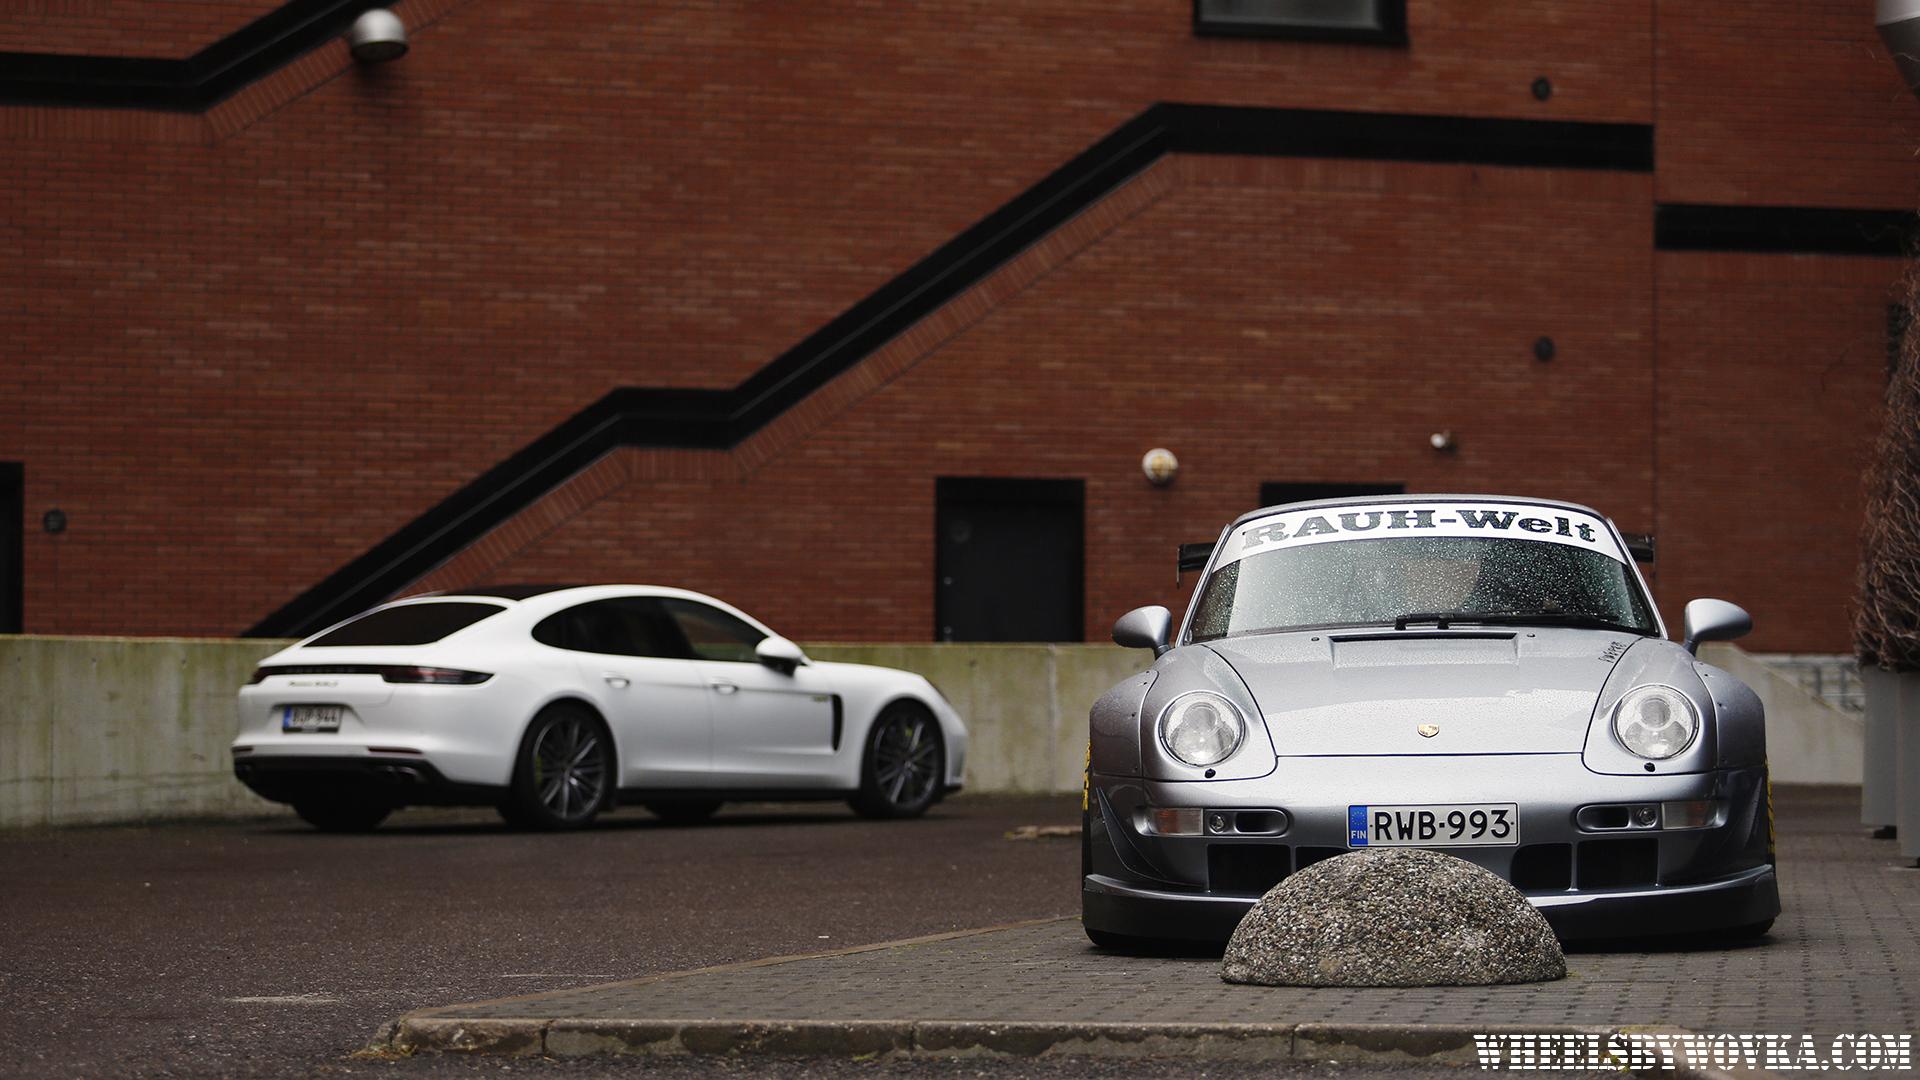 rwb-rauh-welt-nakai-san-porsche-estonia-finland-by-wheelsbywovka-39